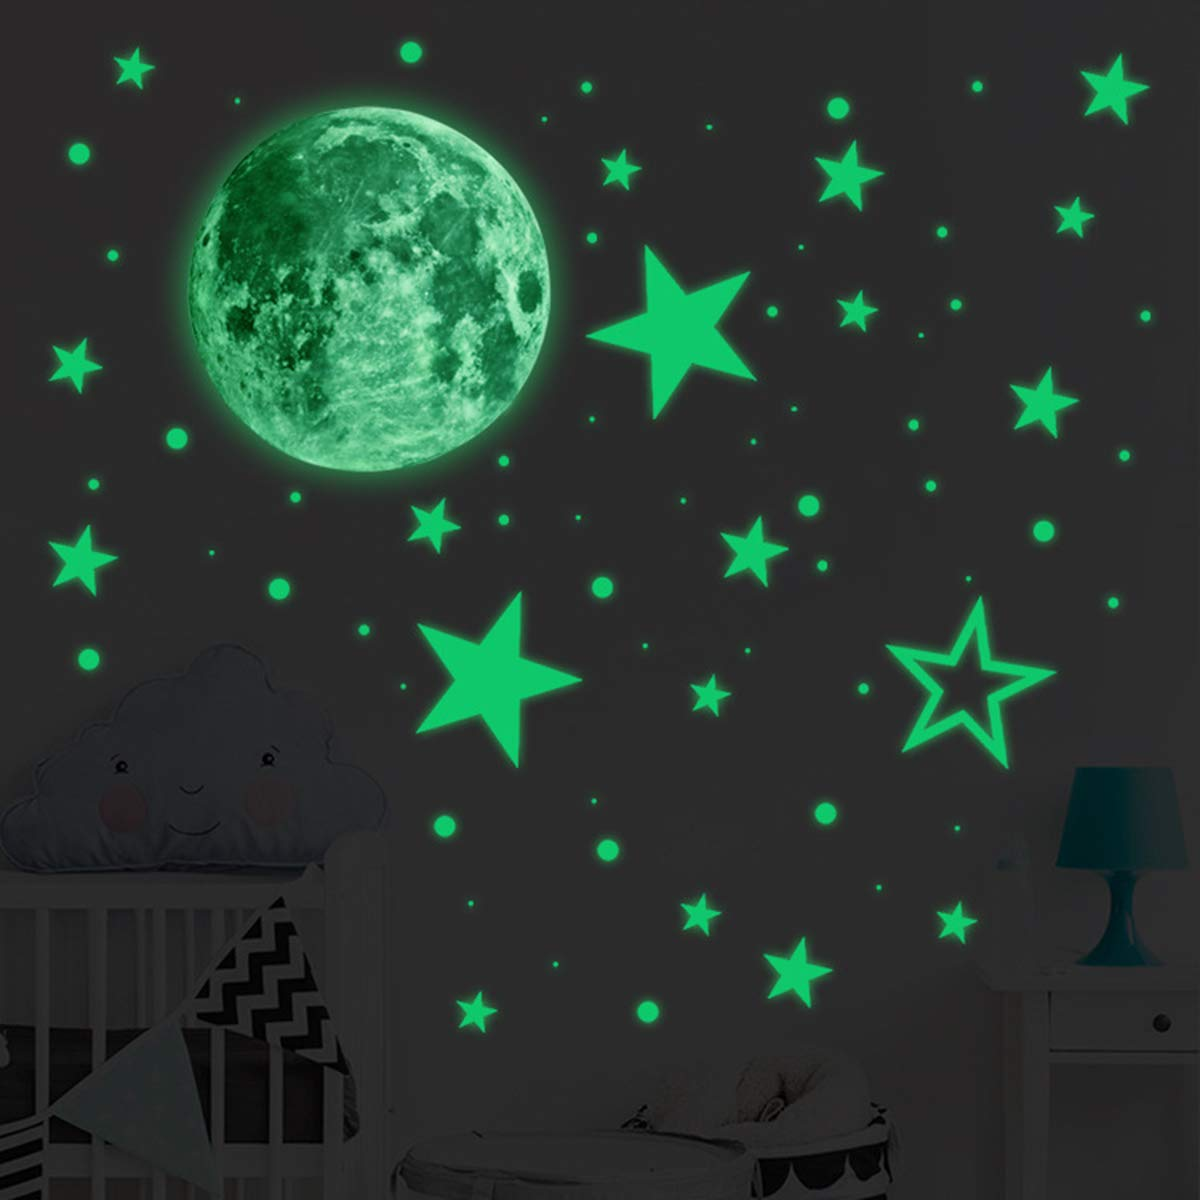 Sternenhimmel Leuchtsterne selbstklebend Sterne Leuchtend Aufkleber 435 St/ück Leuchtaufkleber Mond Wanddeko Aufkleber leuchtaufkleber kinderzimmer IWILCS Leuchtsticker Wandtattoo